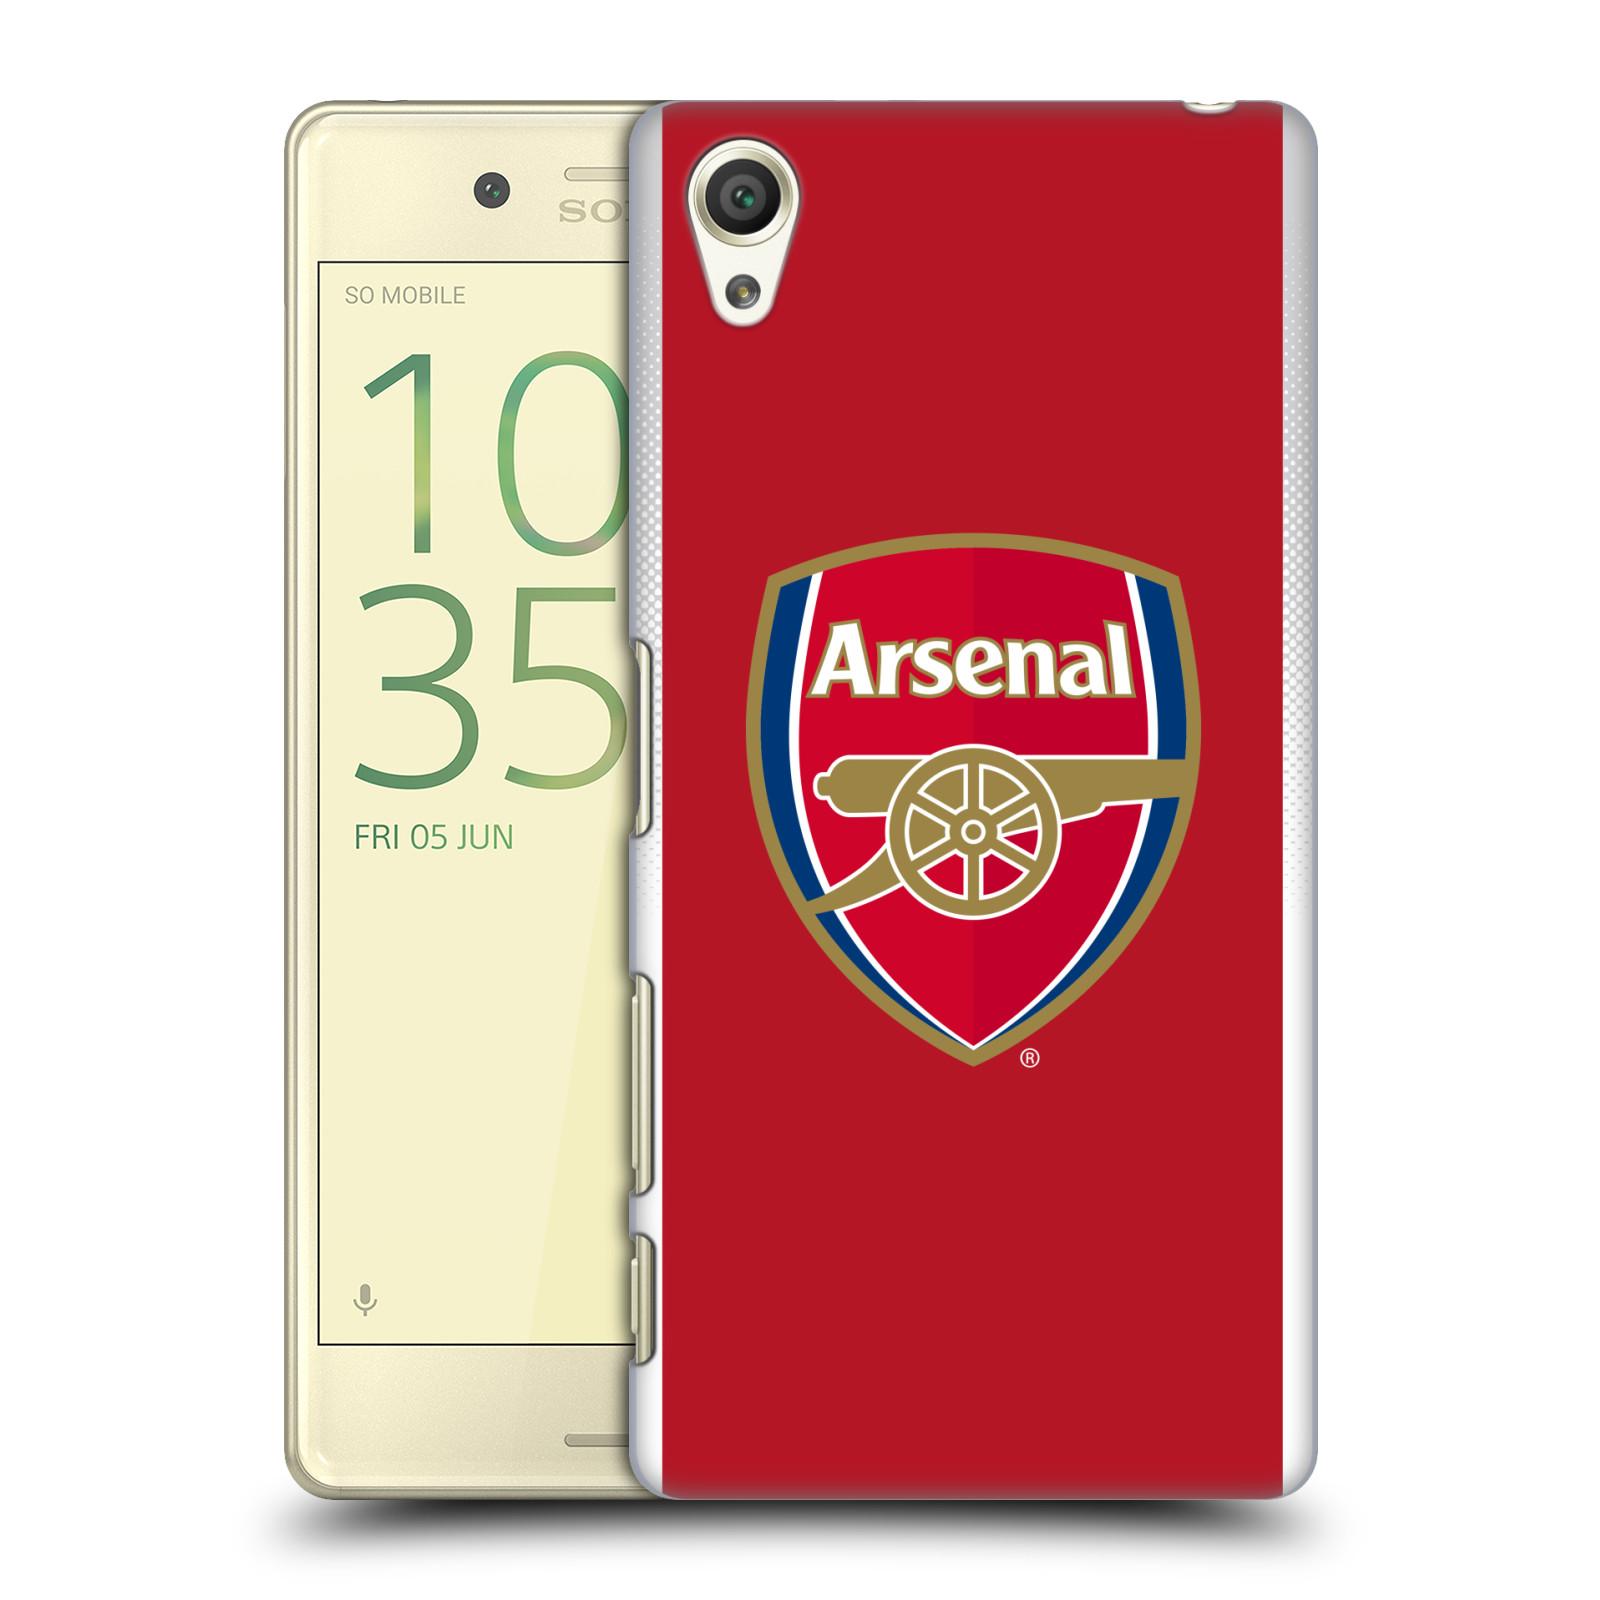 Plastové pouzdro na mobil Sony Xperia X - Head Case - Arsenal FC - Logo klubu